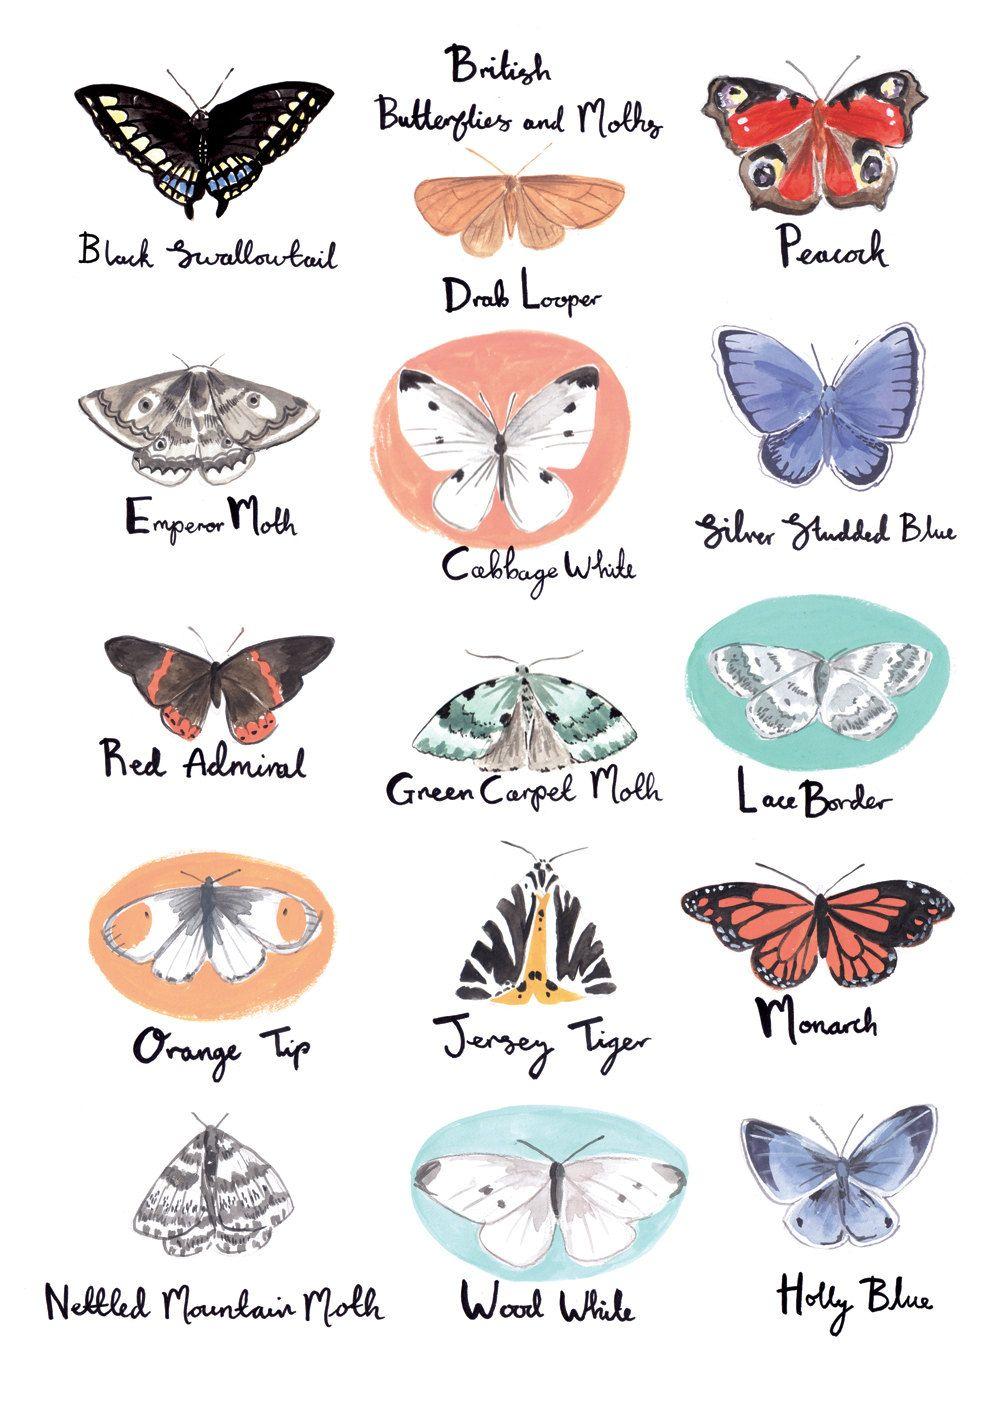 Britse Vlinders En Motten A3 Art Print Etsy Butterfly Art Butterfly Art Print Butterfly Illustration